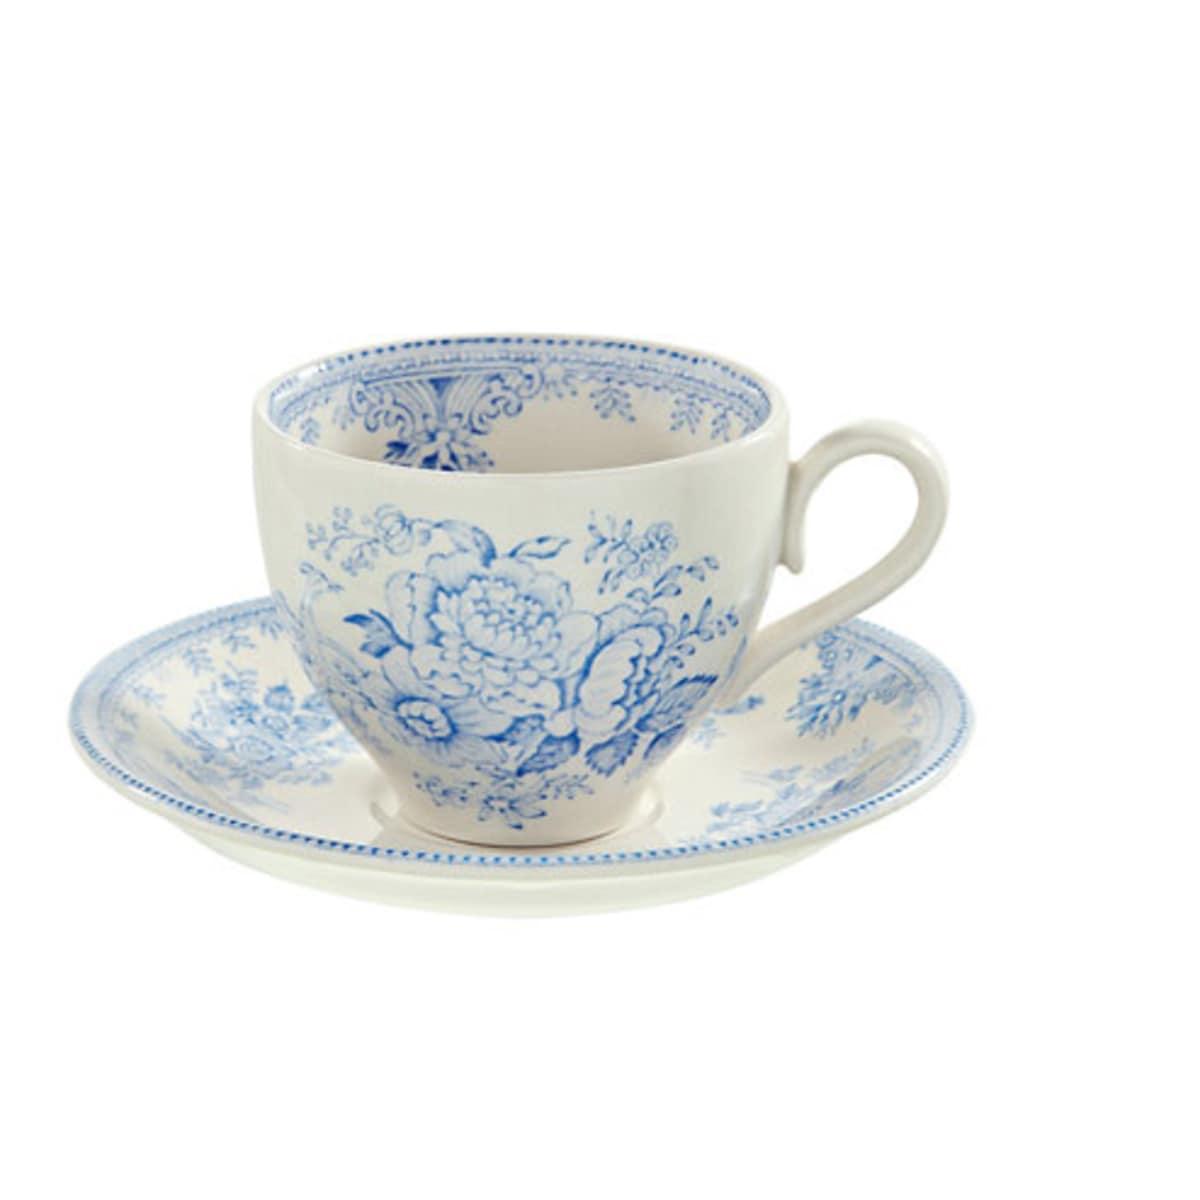 British Isles Burleigh Pottery teacup and saucer